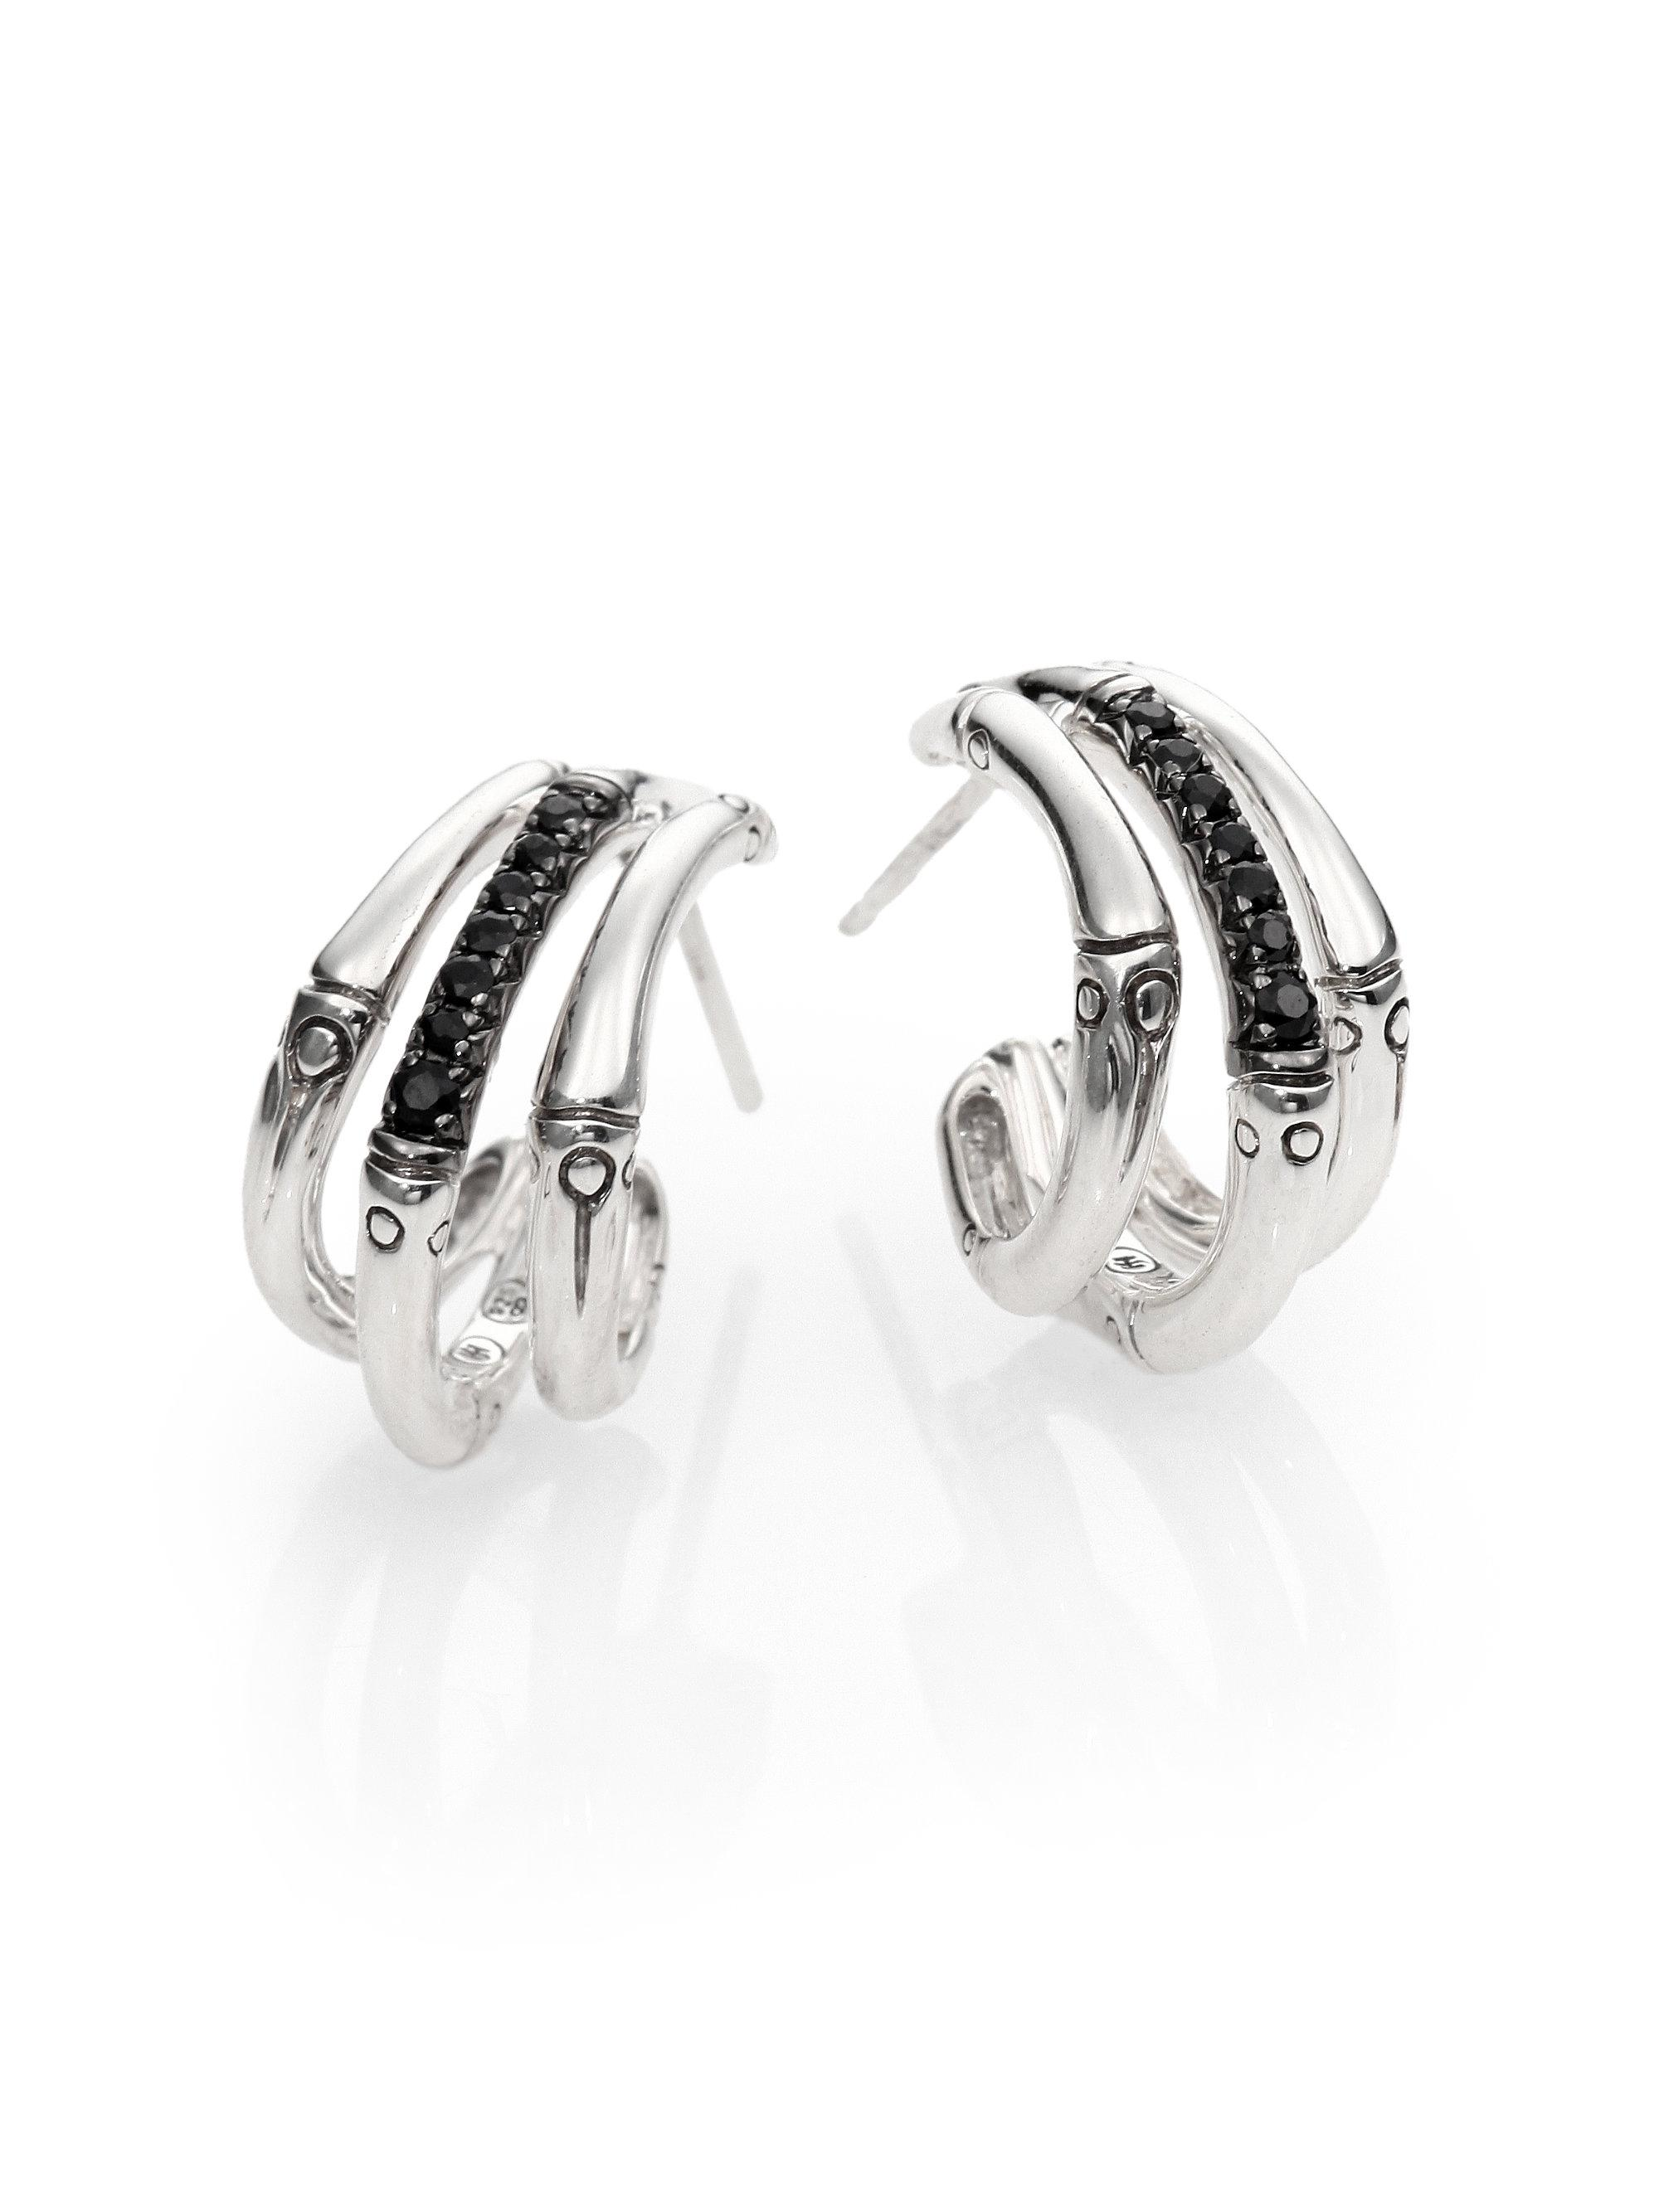 John Hardy Bamboo Silver Lava Large Hoop Earrings, Black Sapphire